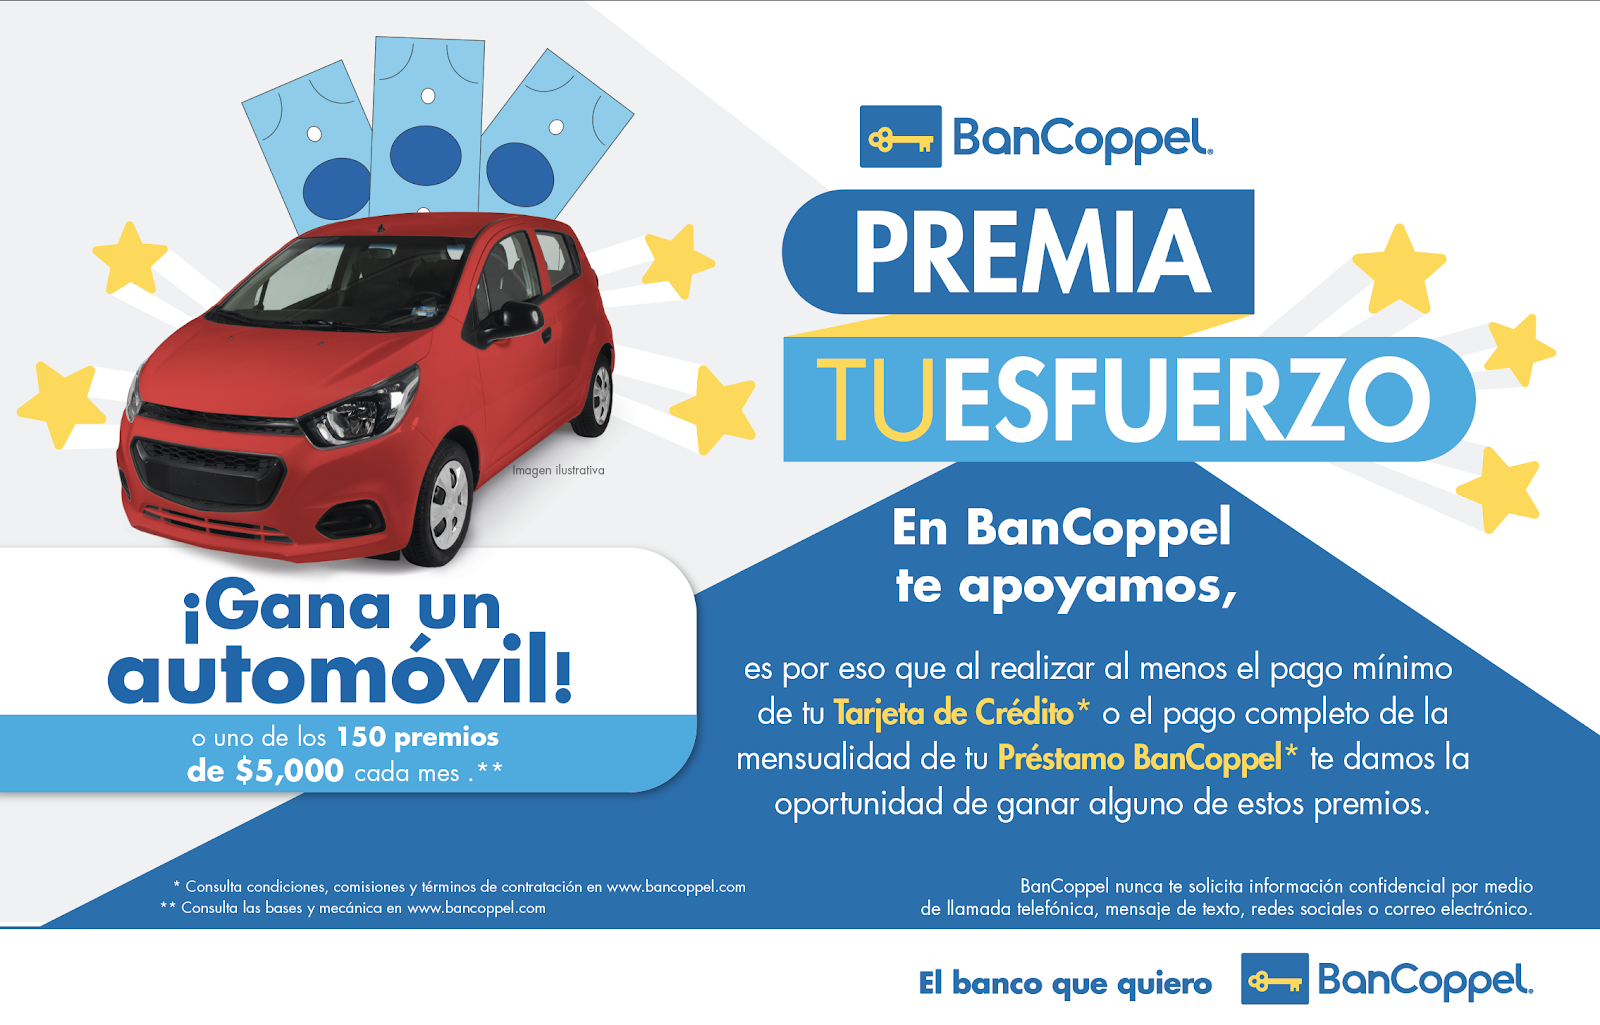 BanCoppel premia tu esfuerzo